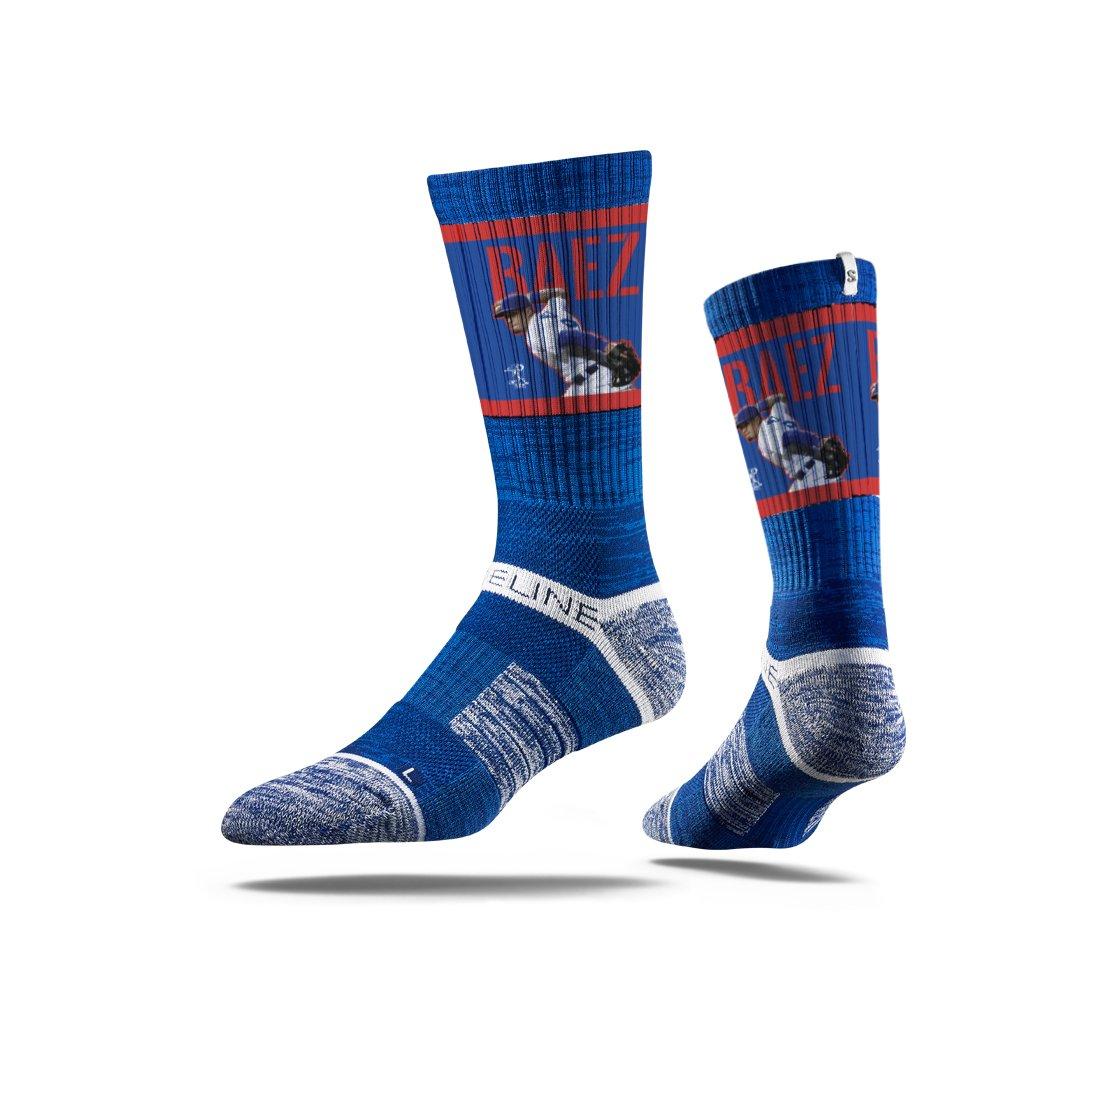 Strideline MLB PA Chicago Cubs Javier Baez Premium Crew Socks, Blue, One Size